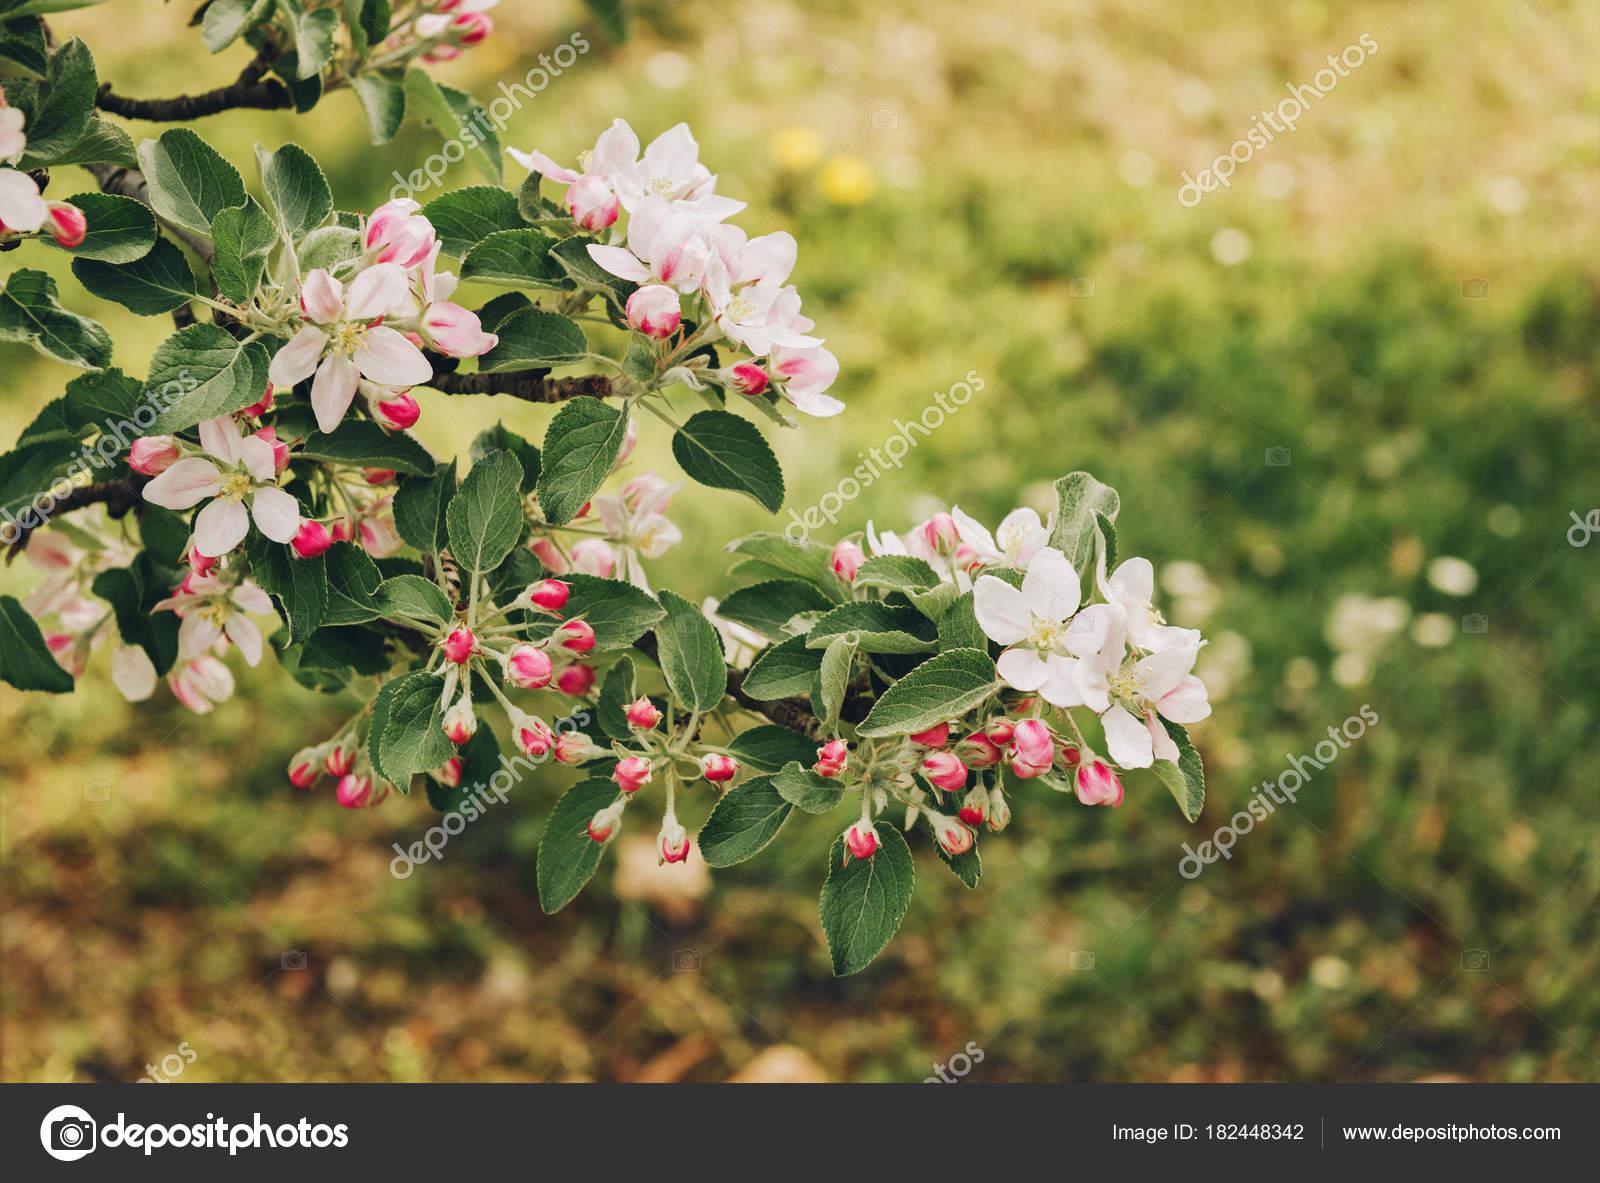 Blooming Apple Tree Large White Flowers Beautiful Natural Seasonsl